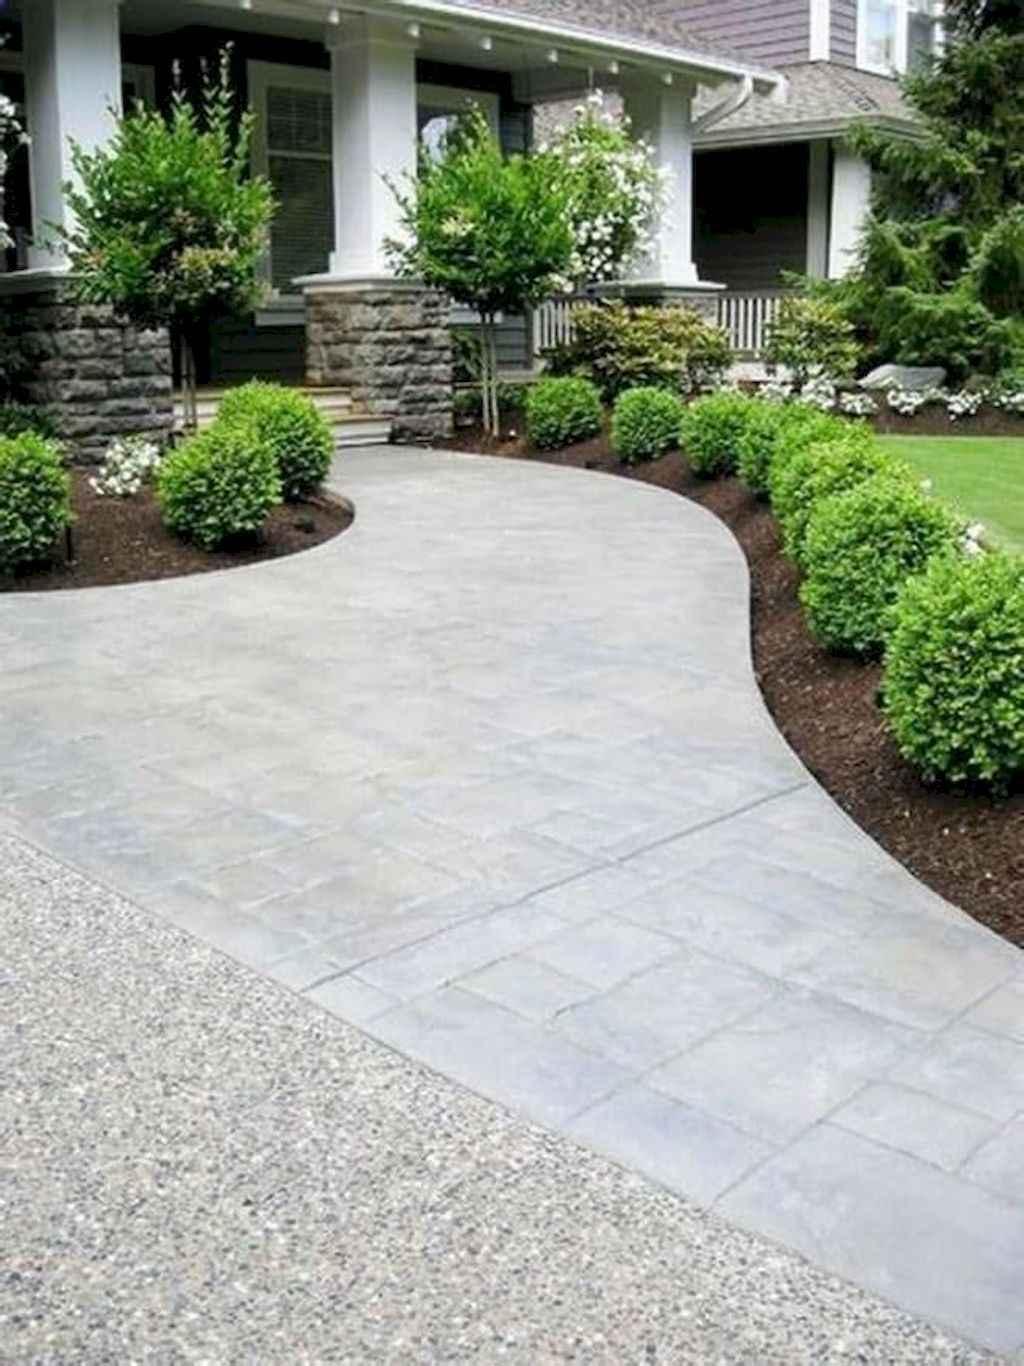 62 Stunning Front Yard Garden Pathways Landscaping Ideas